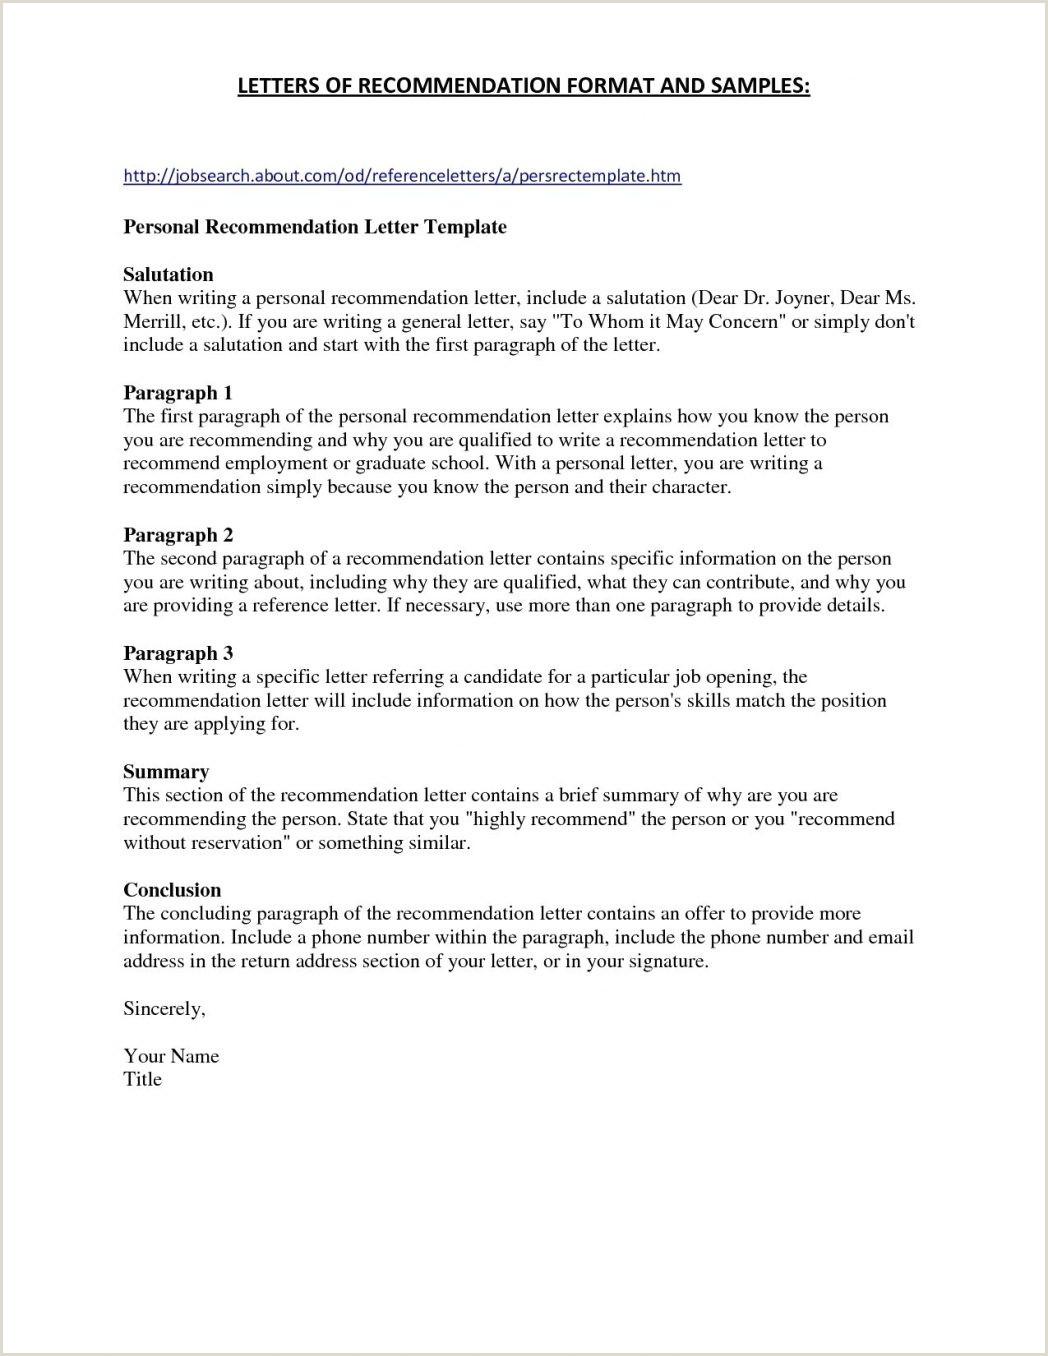 Professional Cv format Editable Examples 11 Programmer Cv HTML5 Curriculum Vitae Word